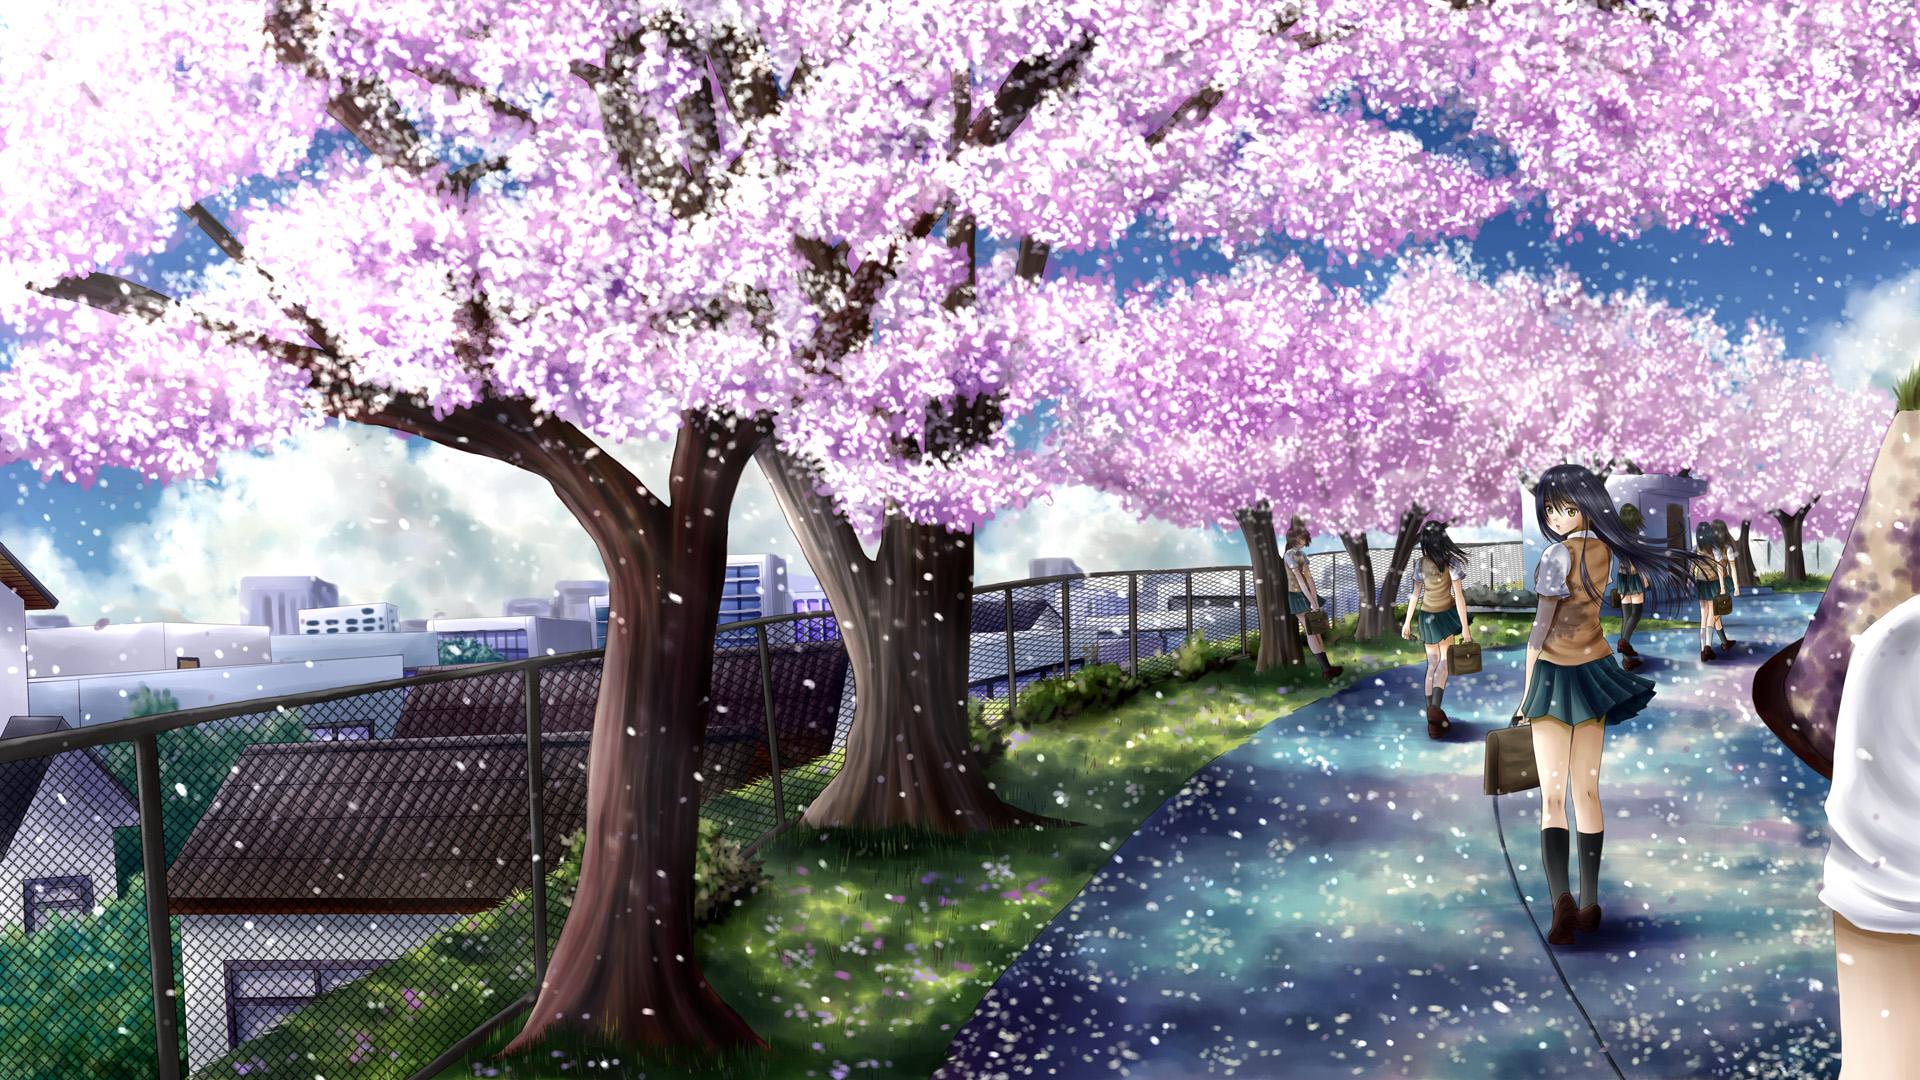 Cherry Blossom Wallpaper Anime - impremedia.net